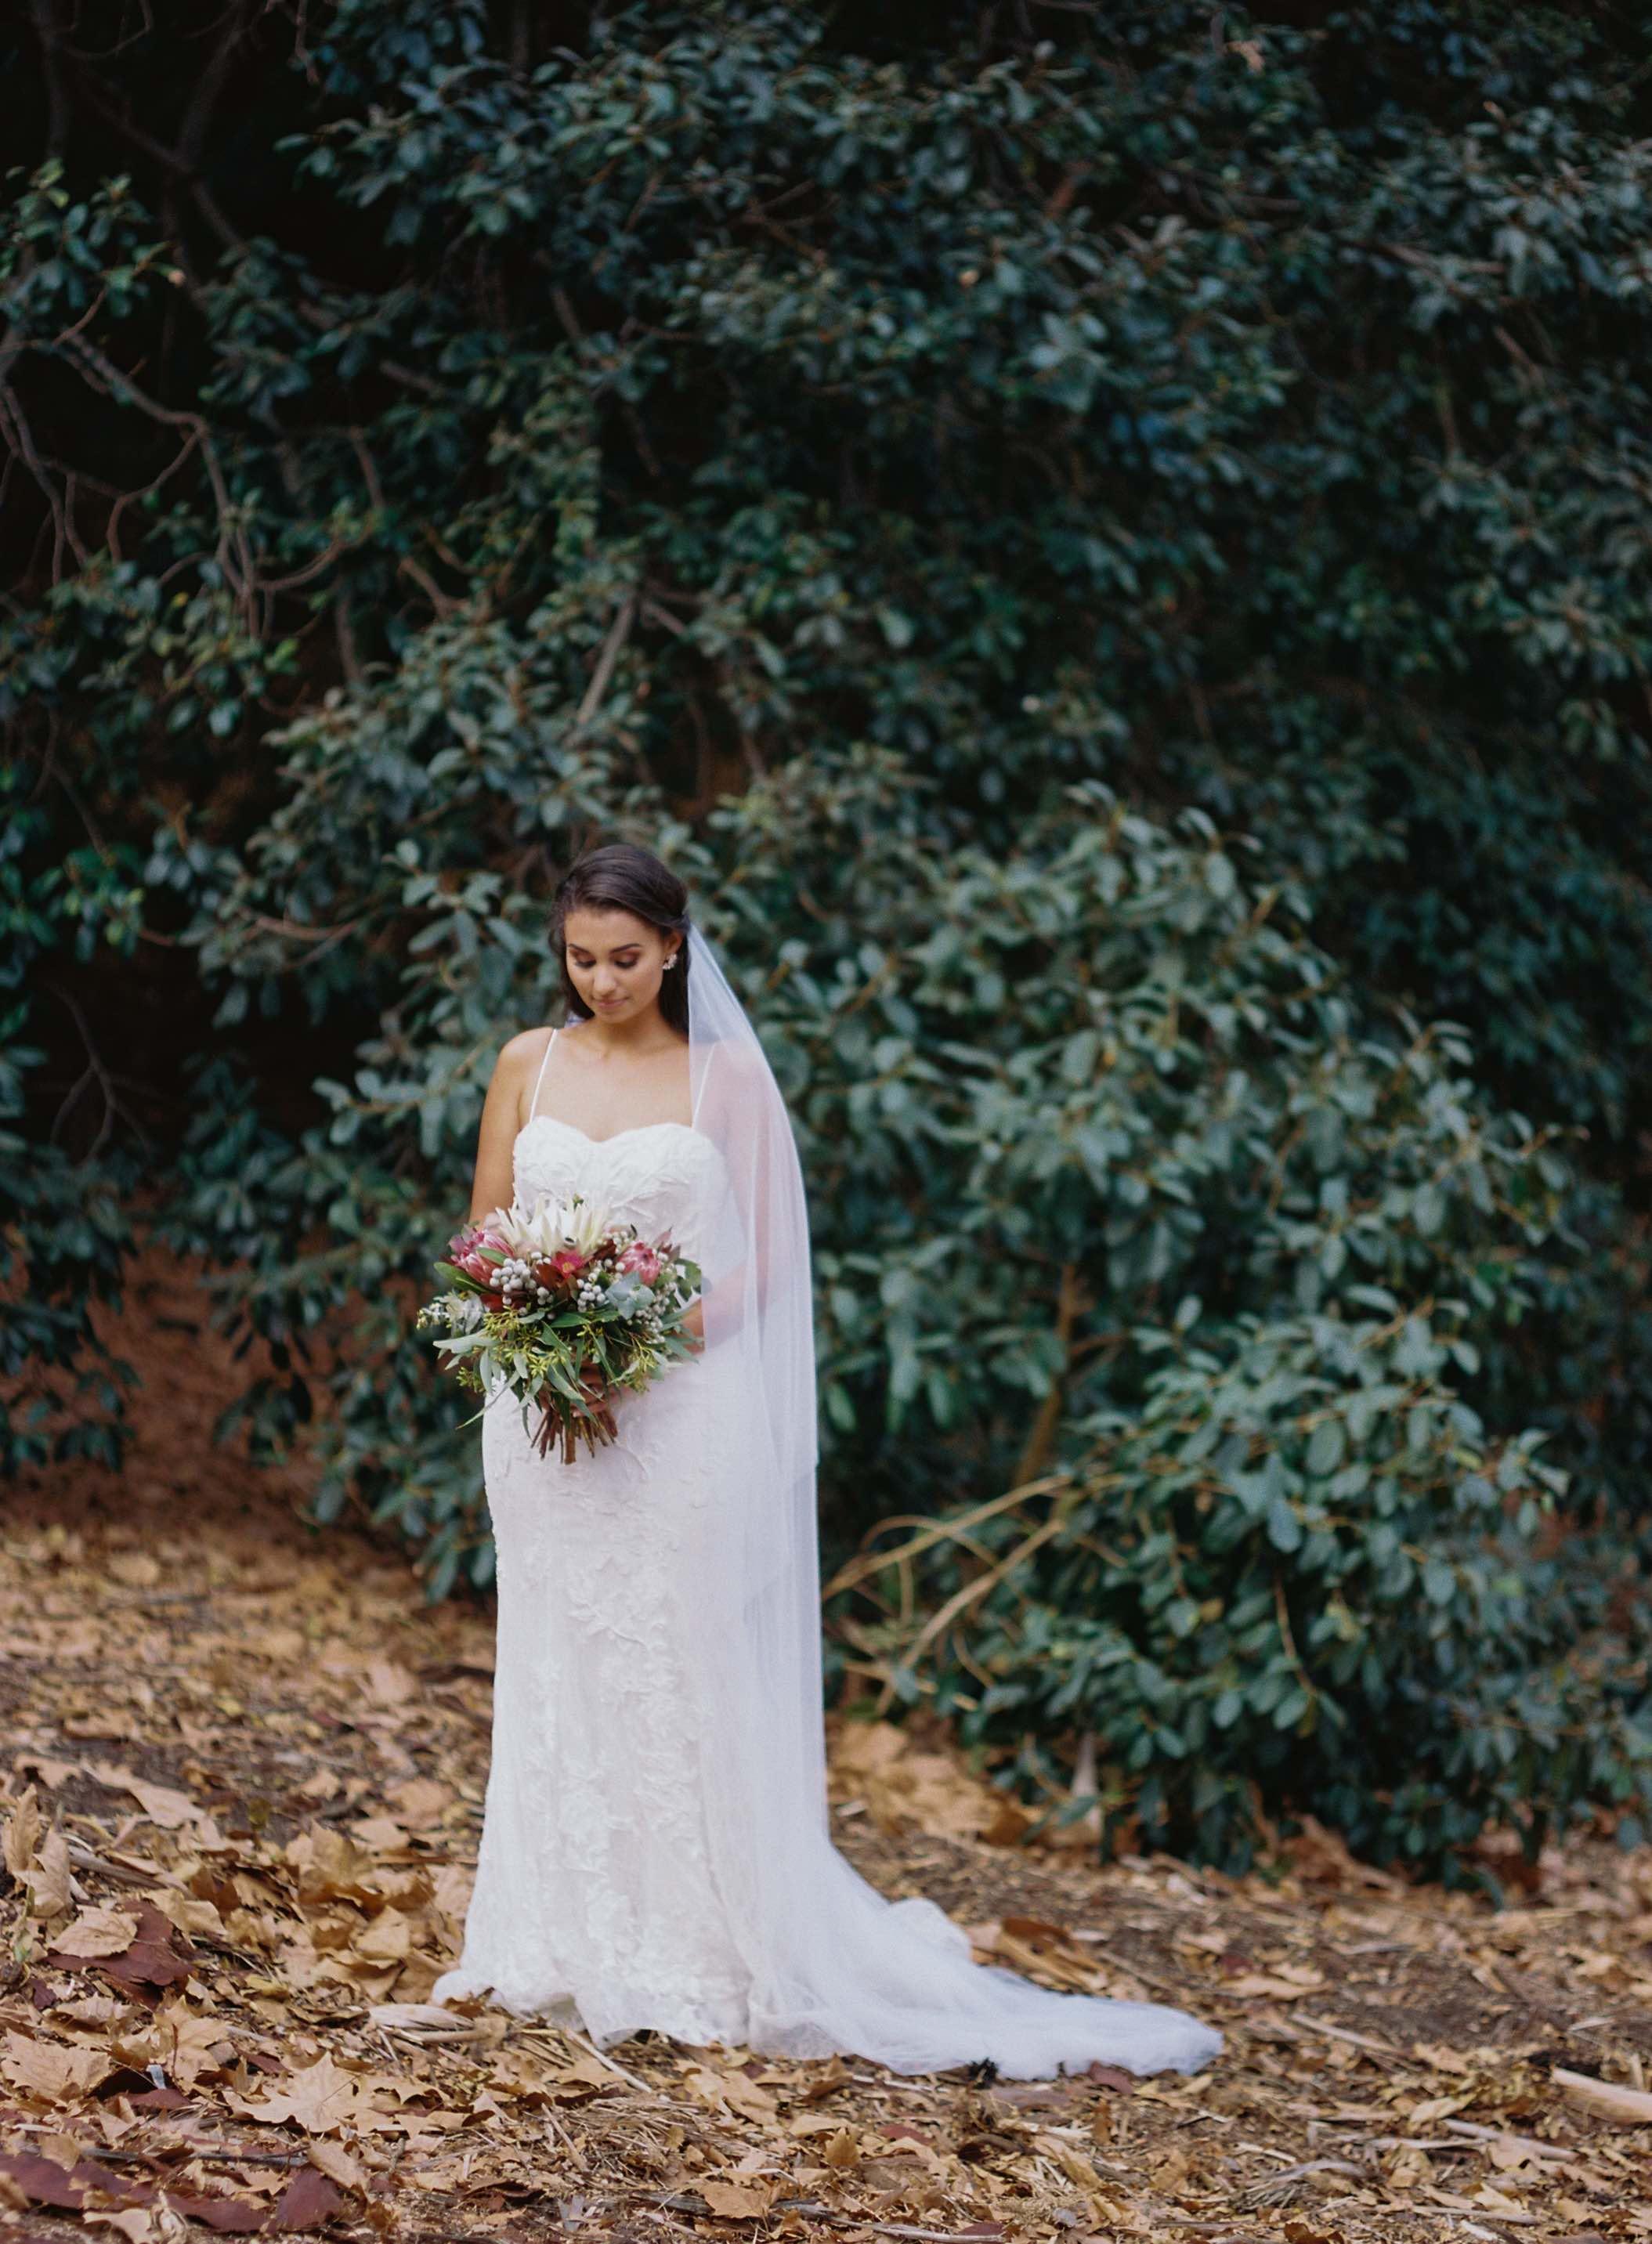 AmeliaClairePhotography_K+J-1-534.jpeg